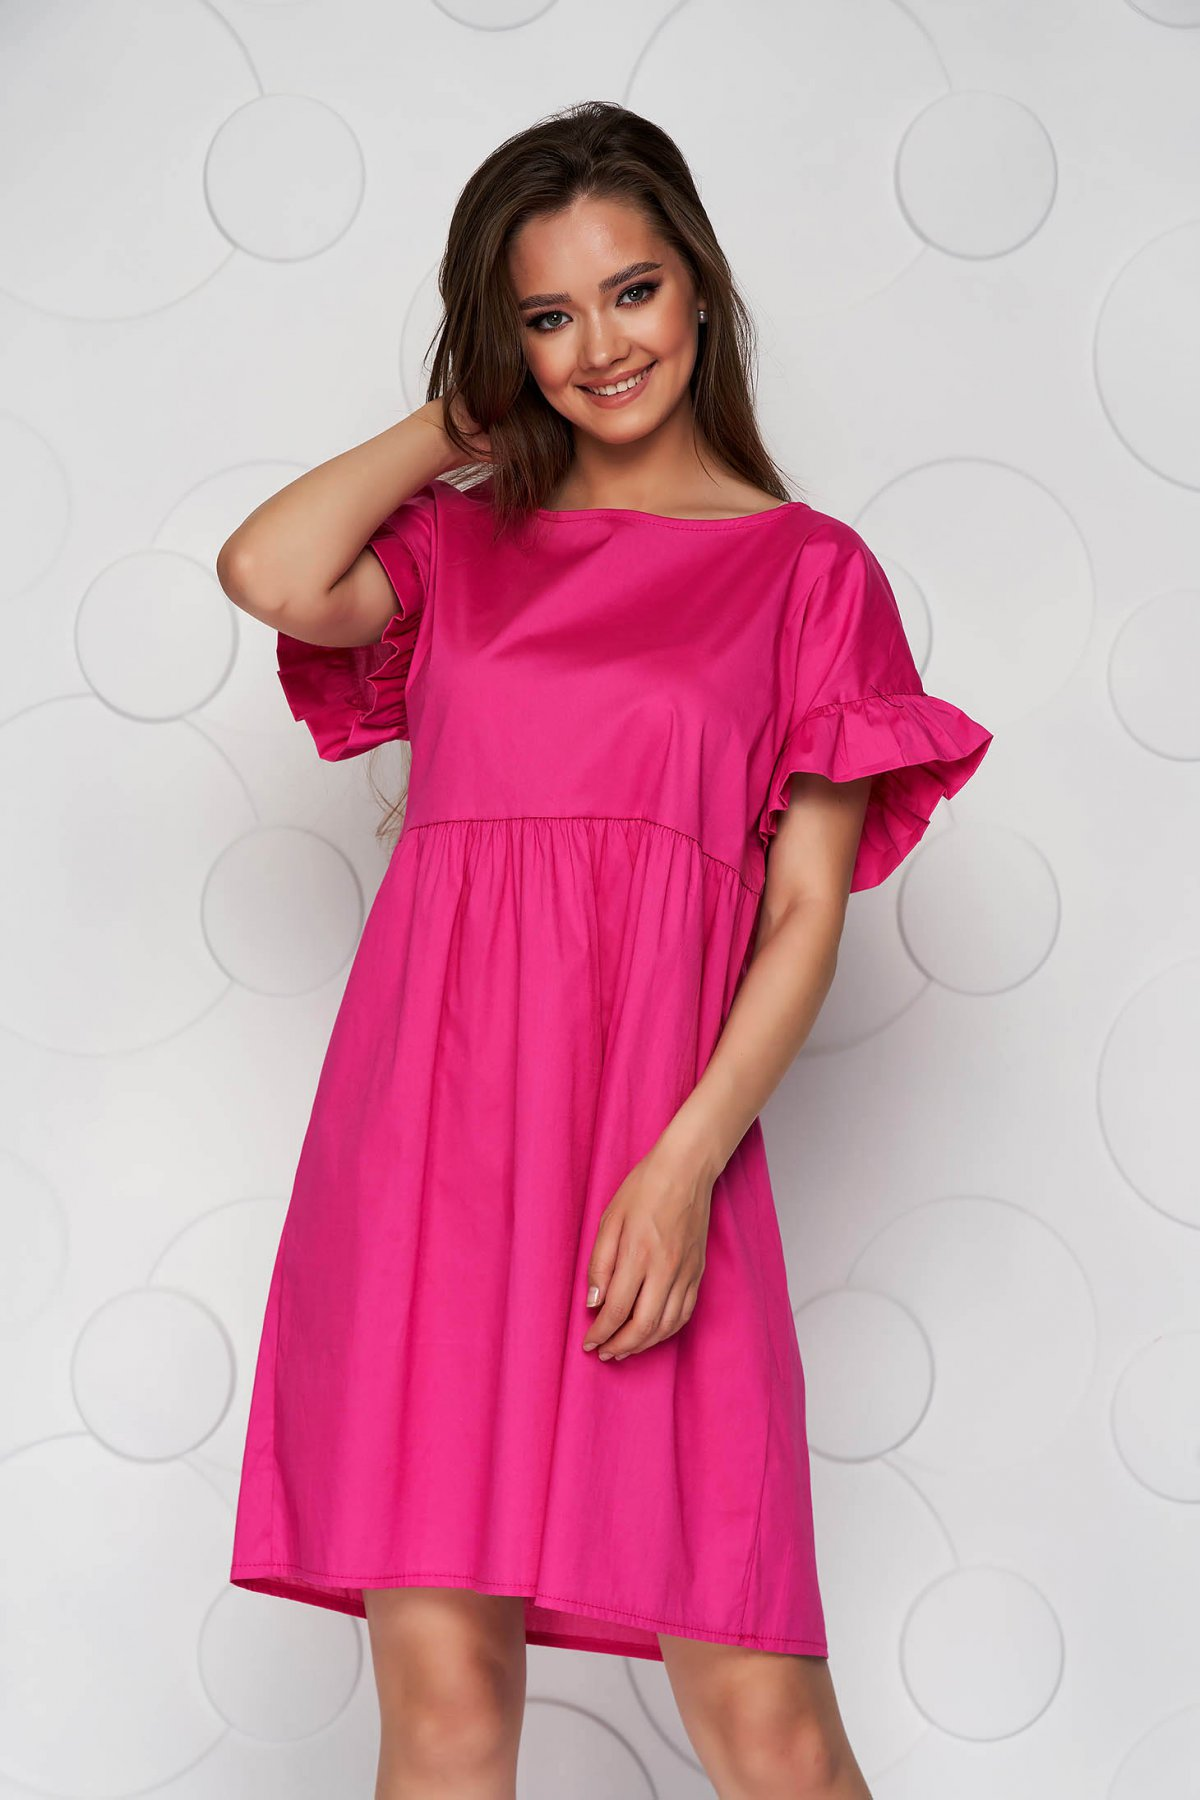 Rochie roz din poplin cu croi larg cu volanase - medelin.ro